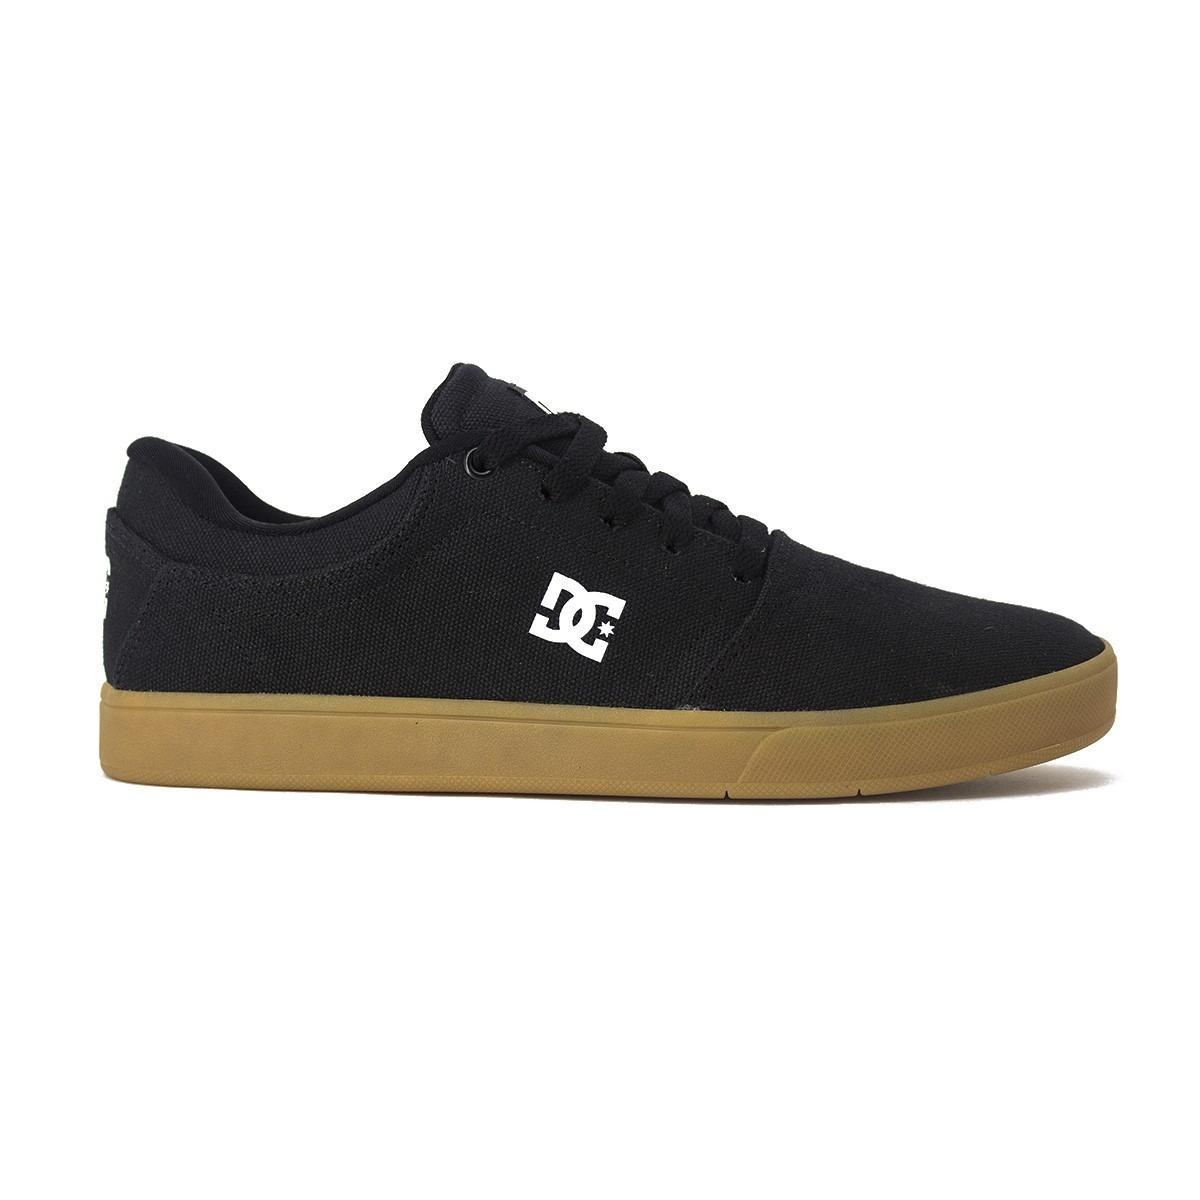 tenis dc shoes crisis tx black gum original frete gratis. Carregando zoom. 95f4ba6932f2f